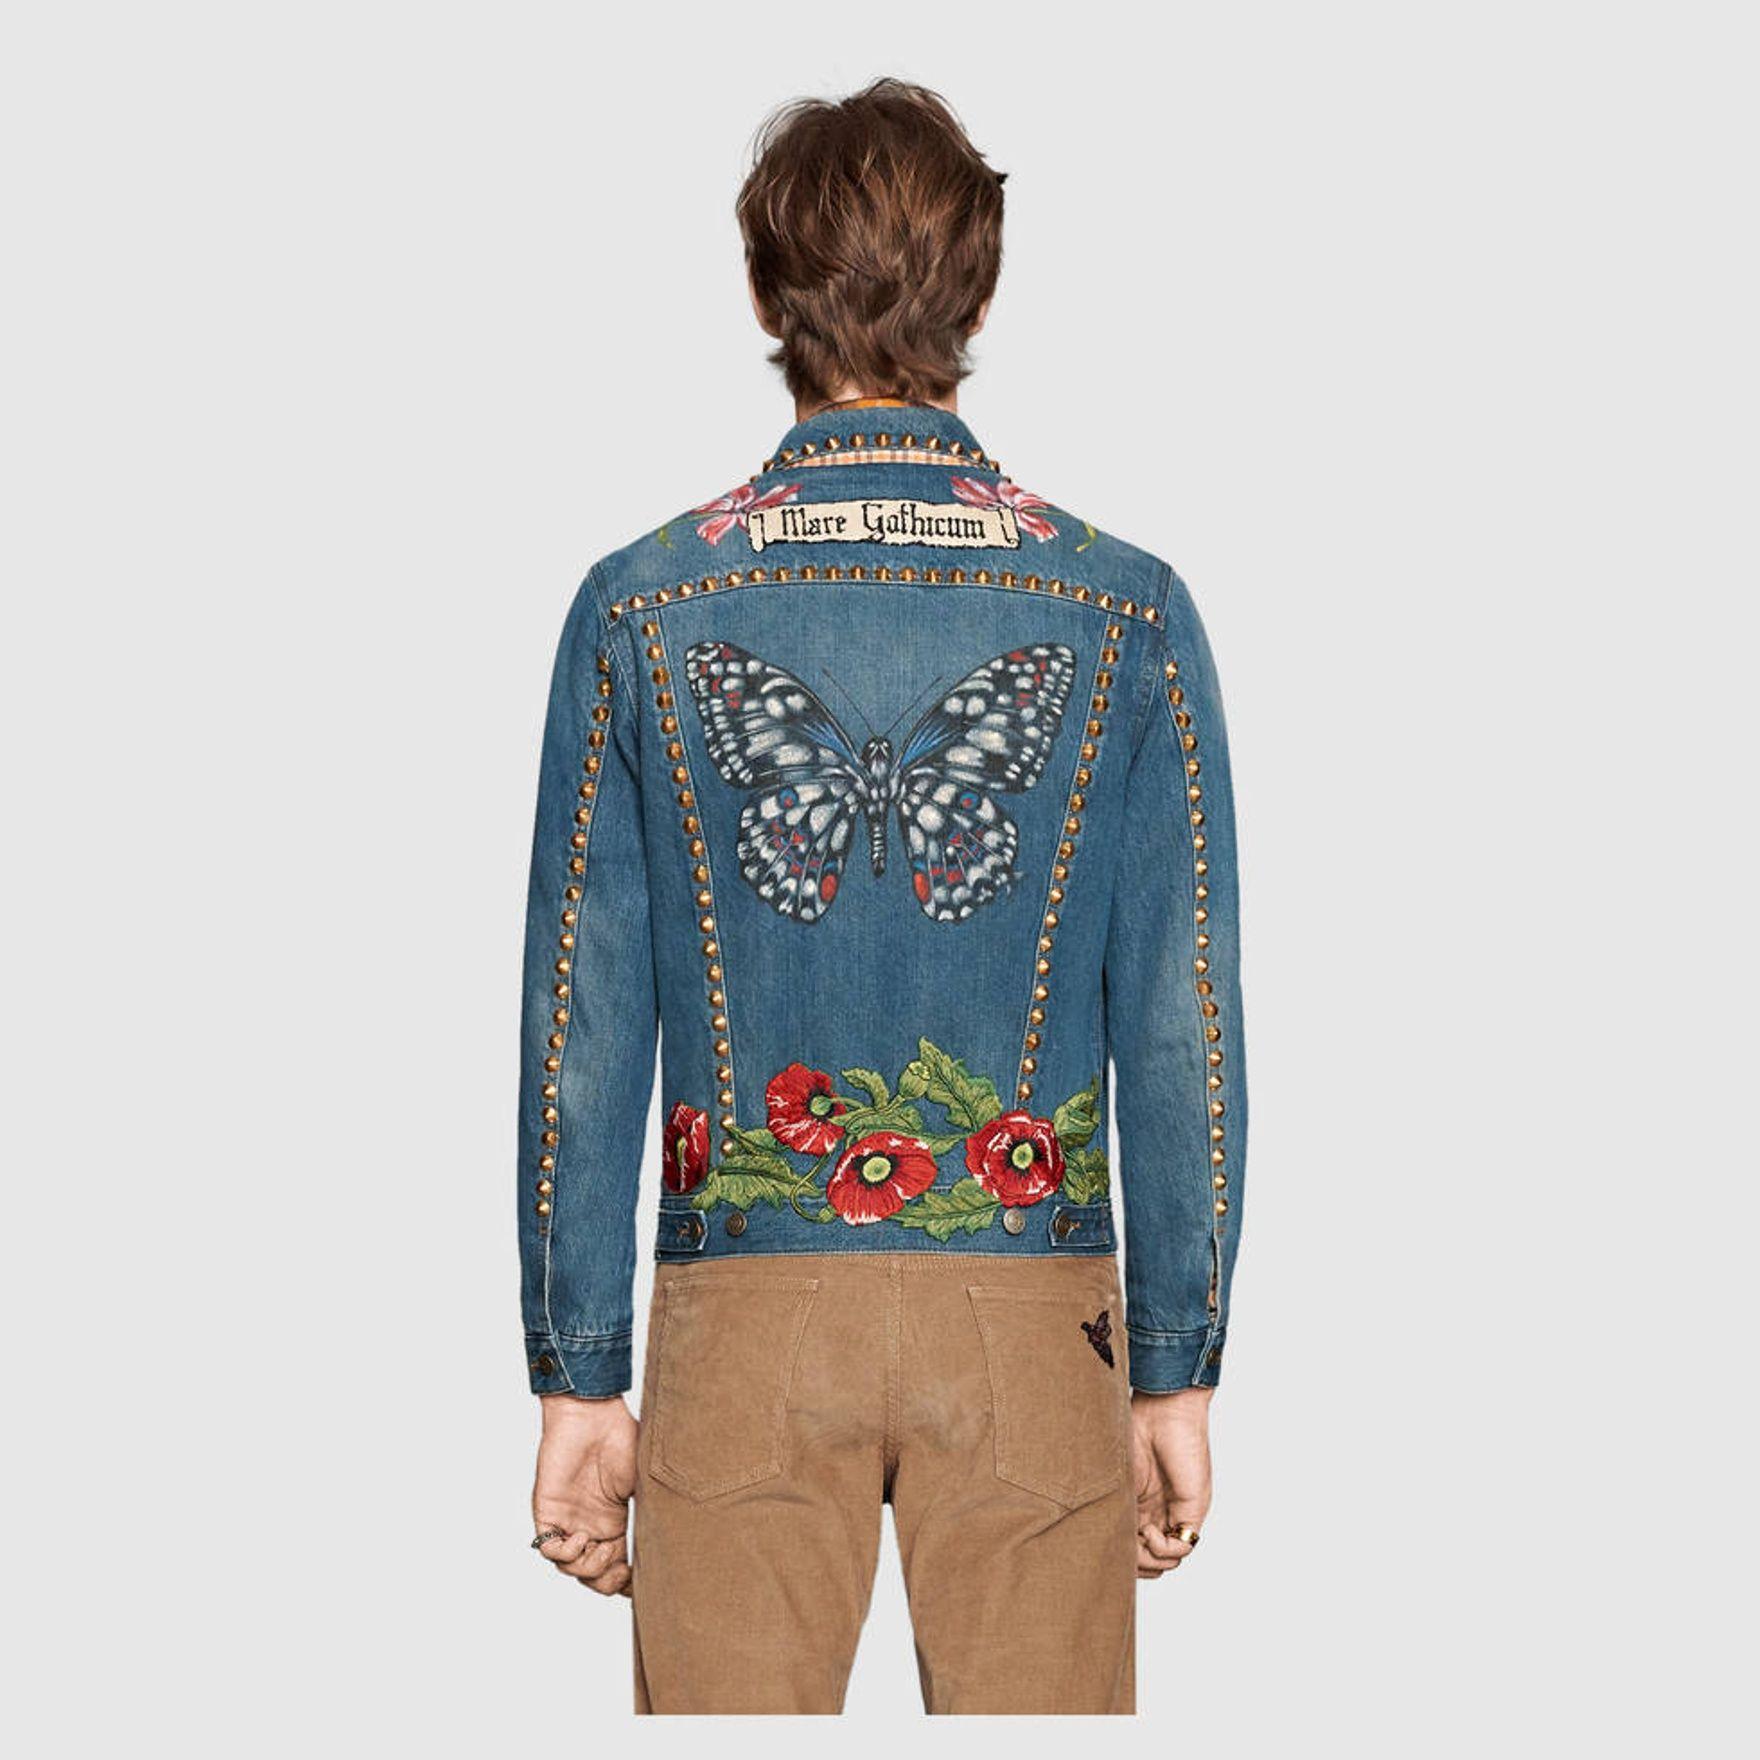 3bed122f Gucci Mare Gothicum denim jacket size 46 Size US S / EU 44-46 / 1 ...